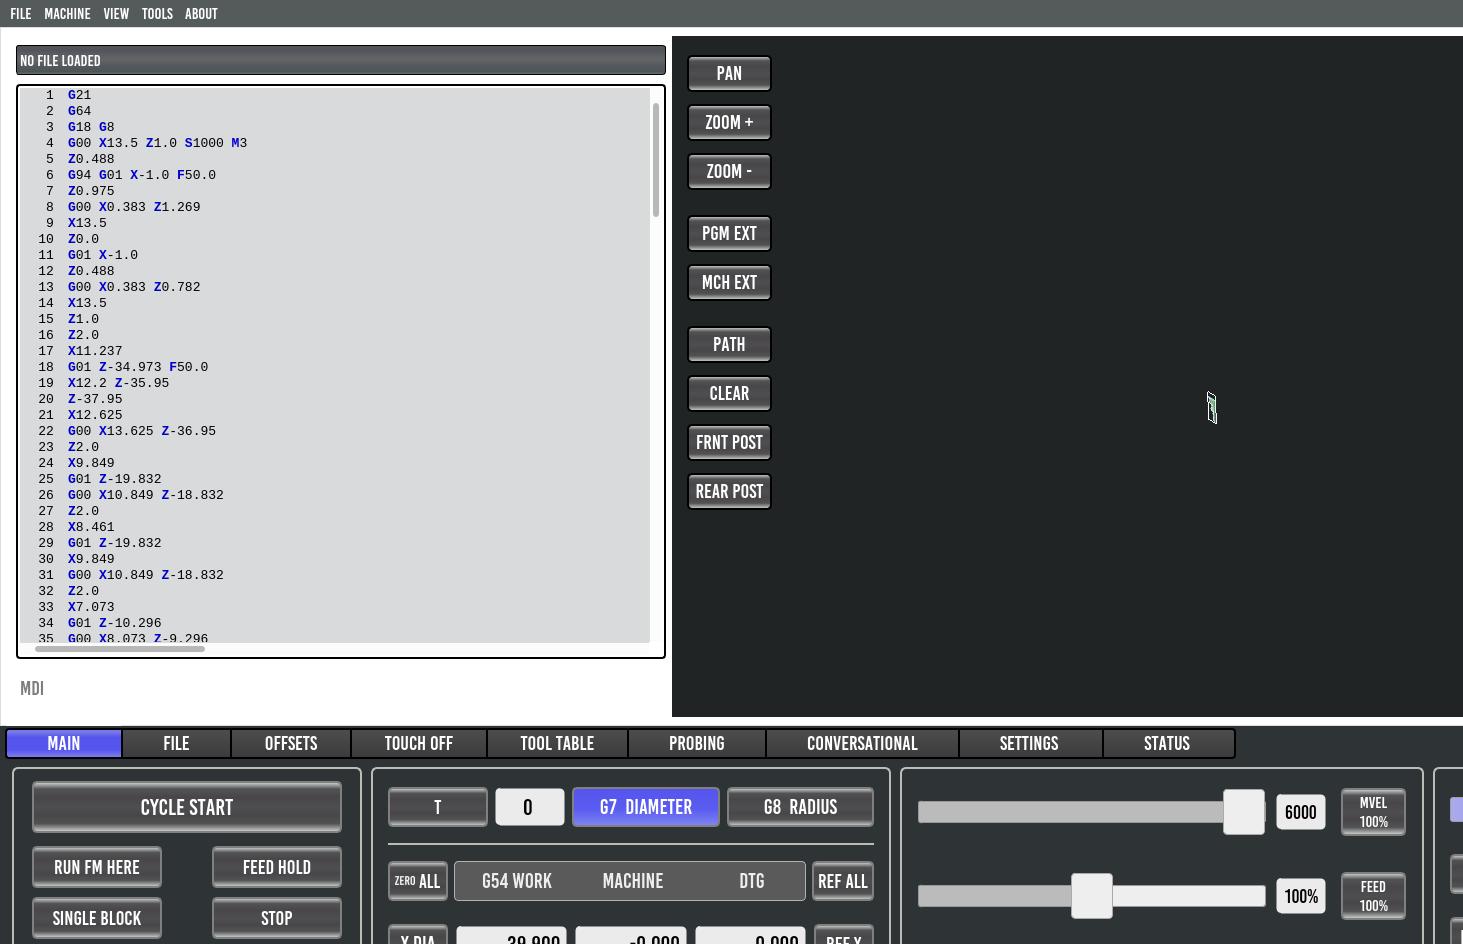 Screenshot_2021-04-15_20-38-29.png